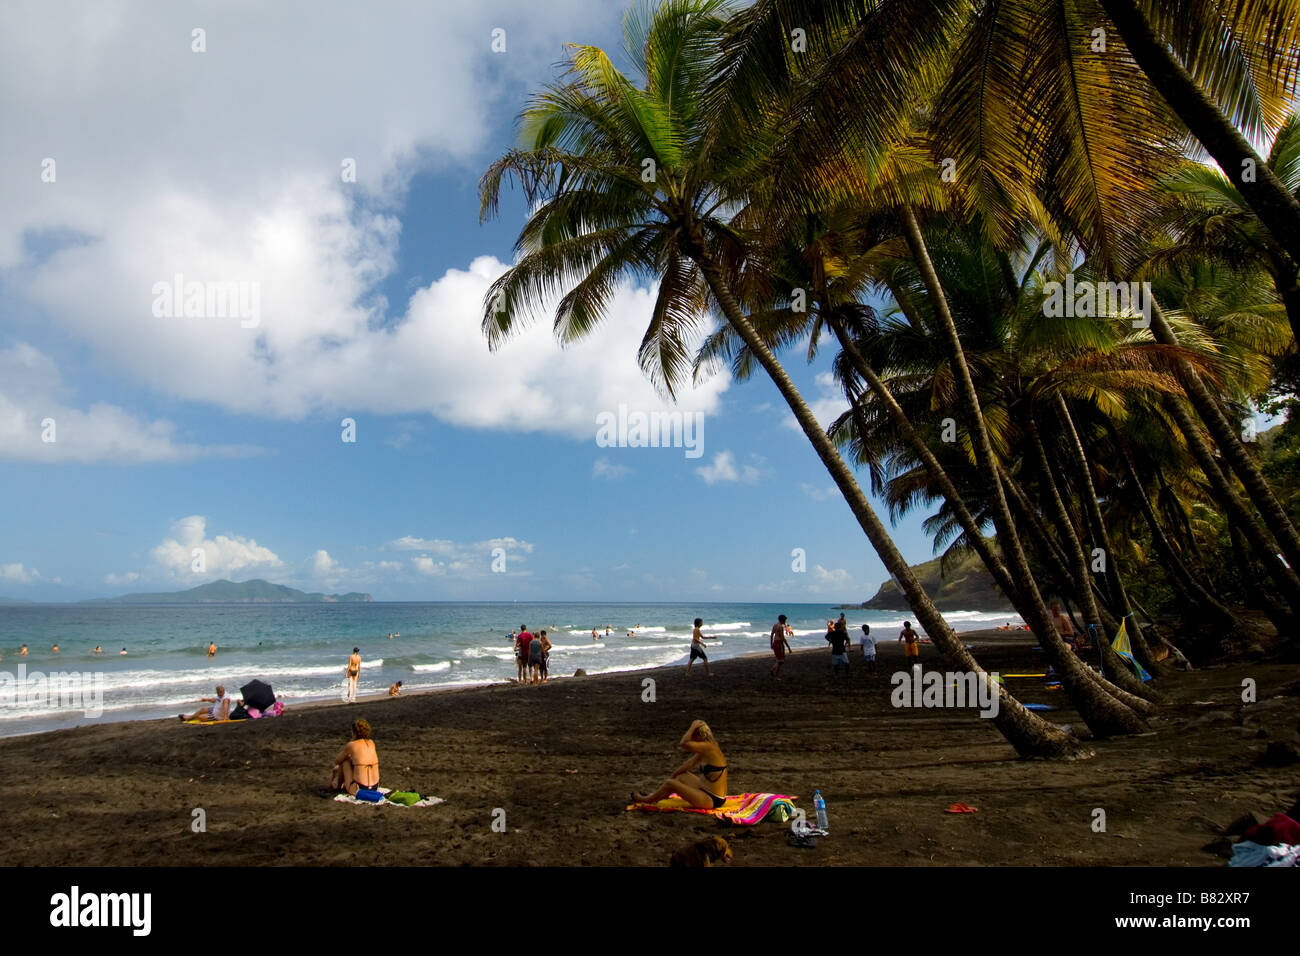 Nicaragua,  Black beach volcanic sand, palm trees, paradise, people at beach Stock Photo